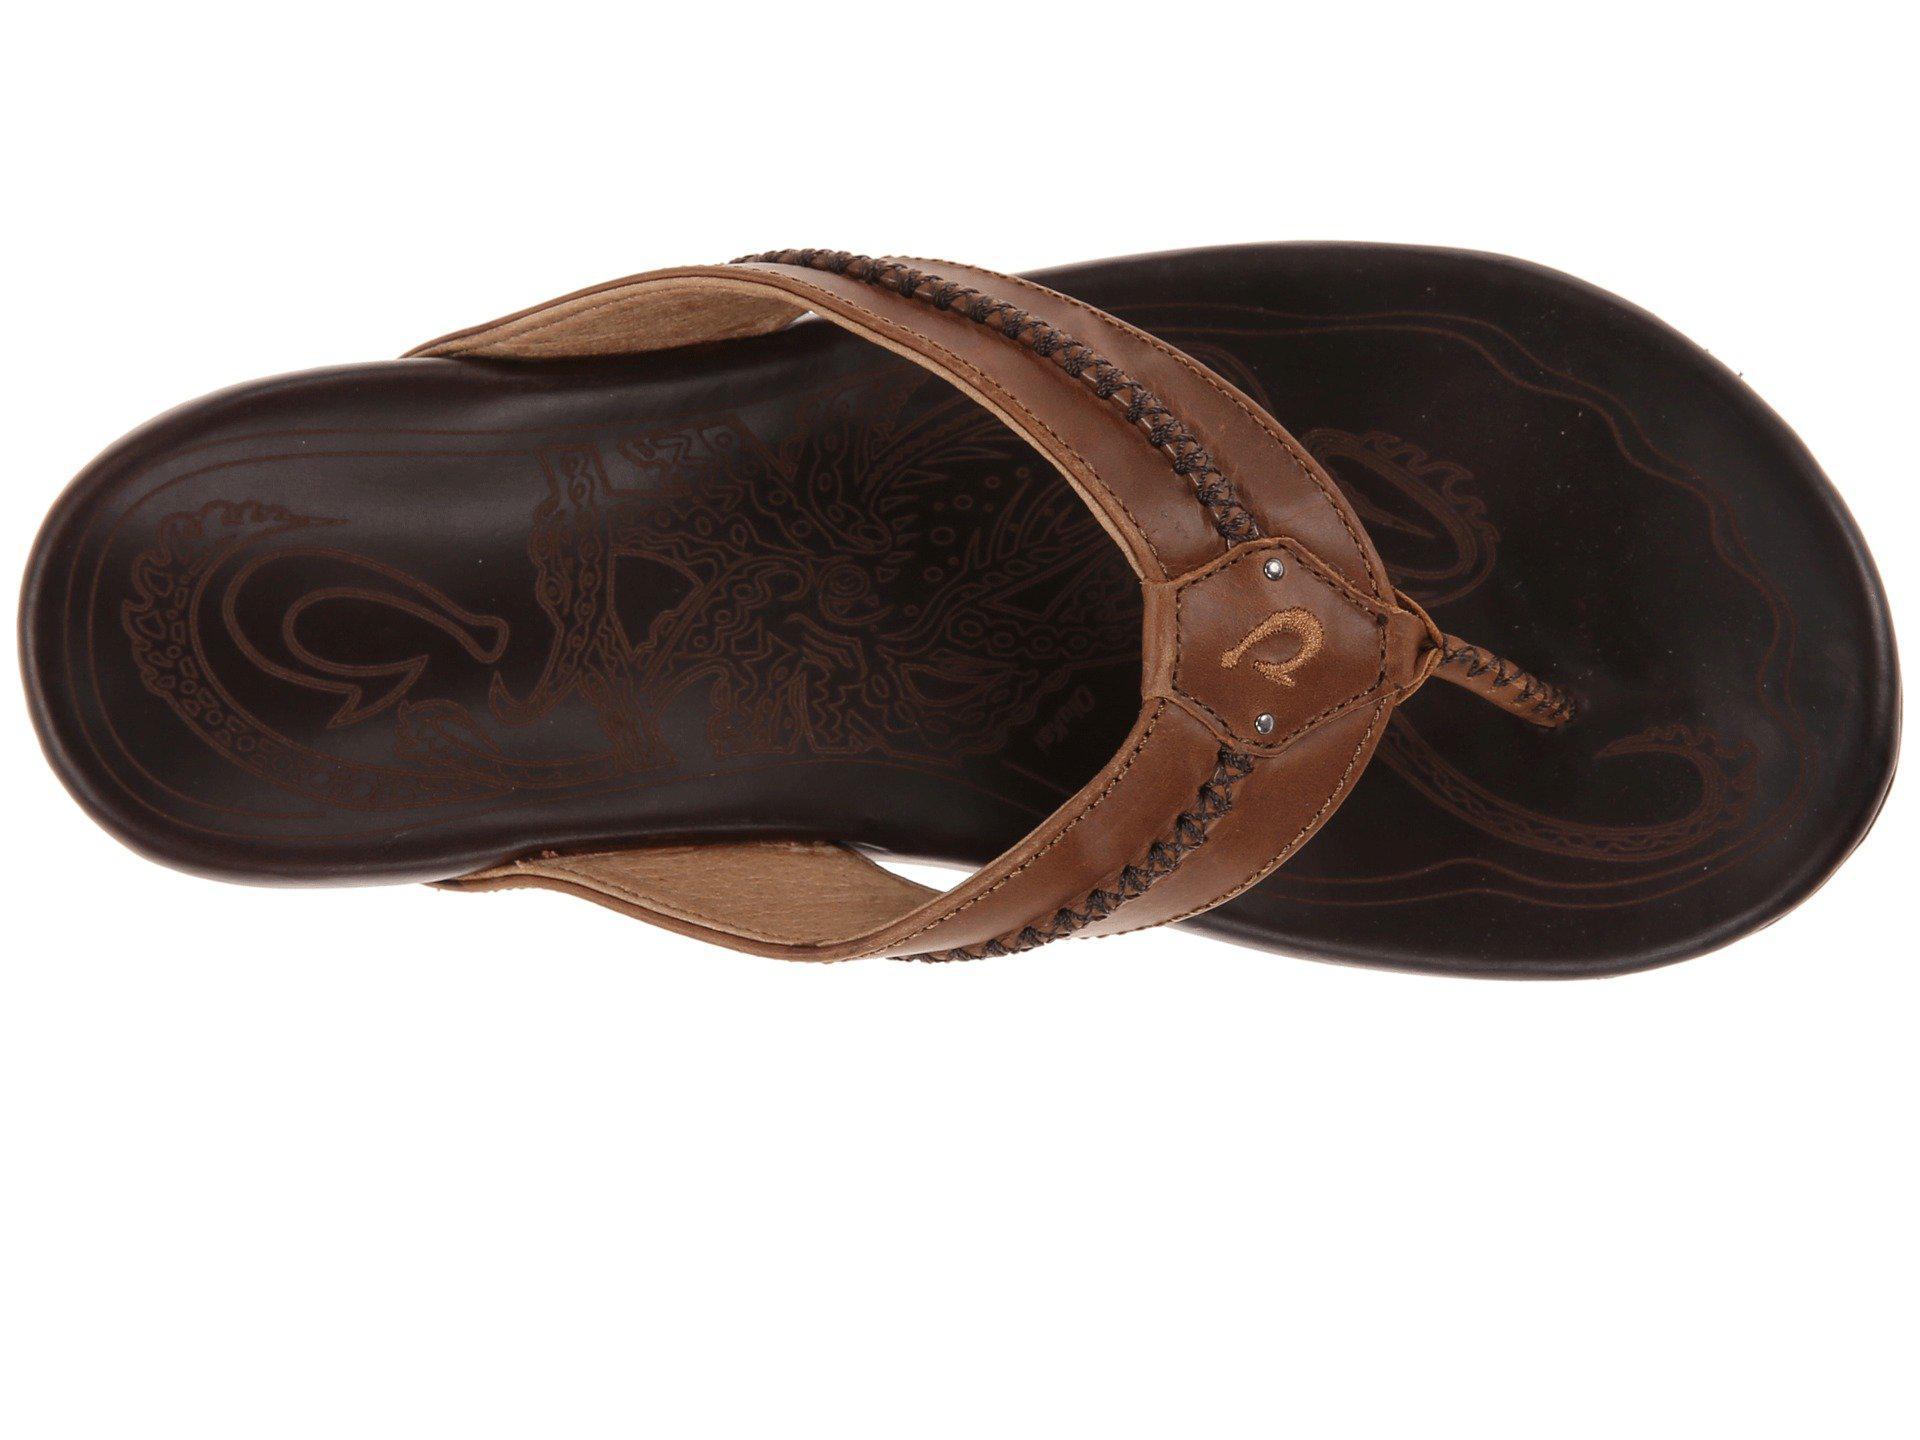 fedd2b0b405ae Olukai - Brown Mea Ola (terra dark Wood) Men s Sandals for Men -. View  fullscreen